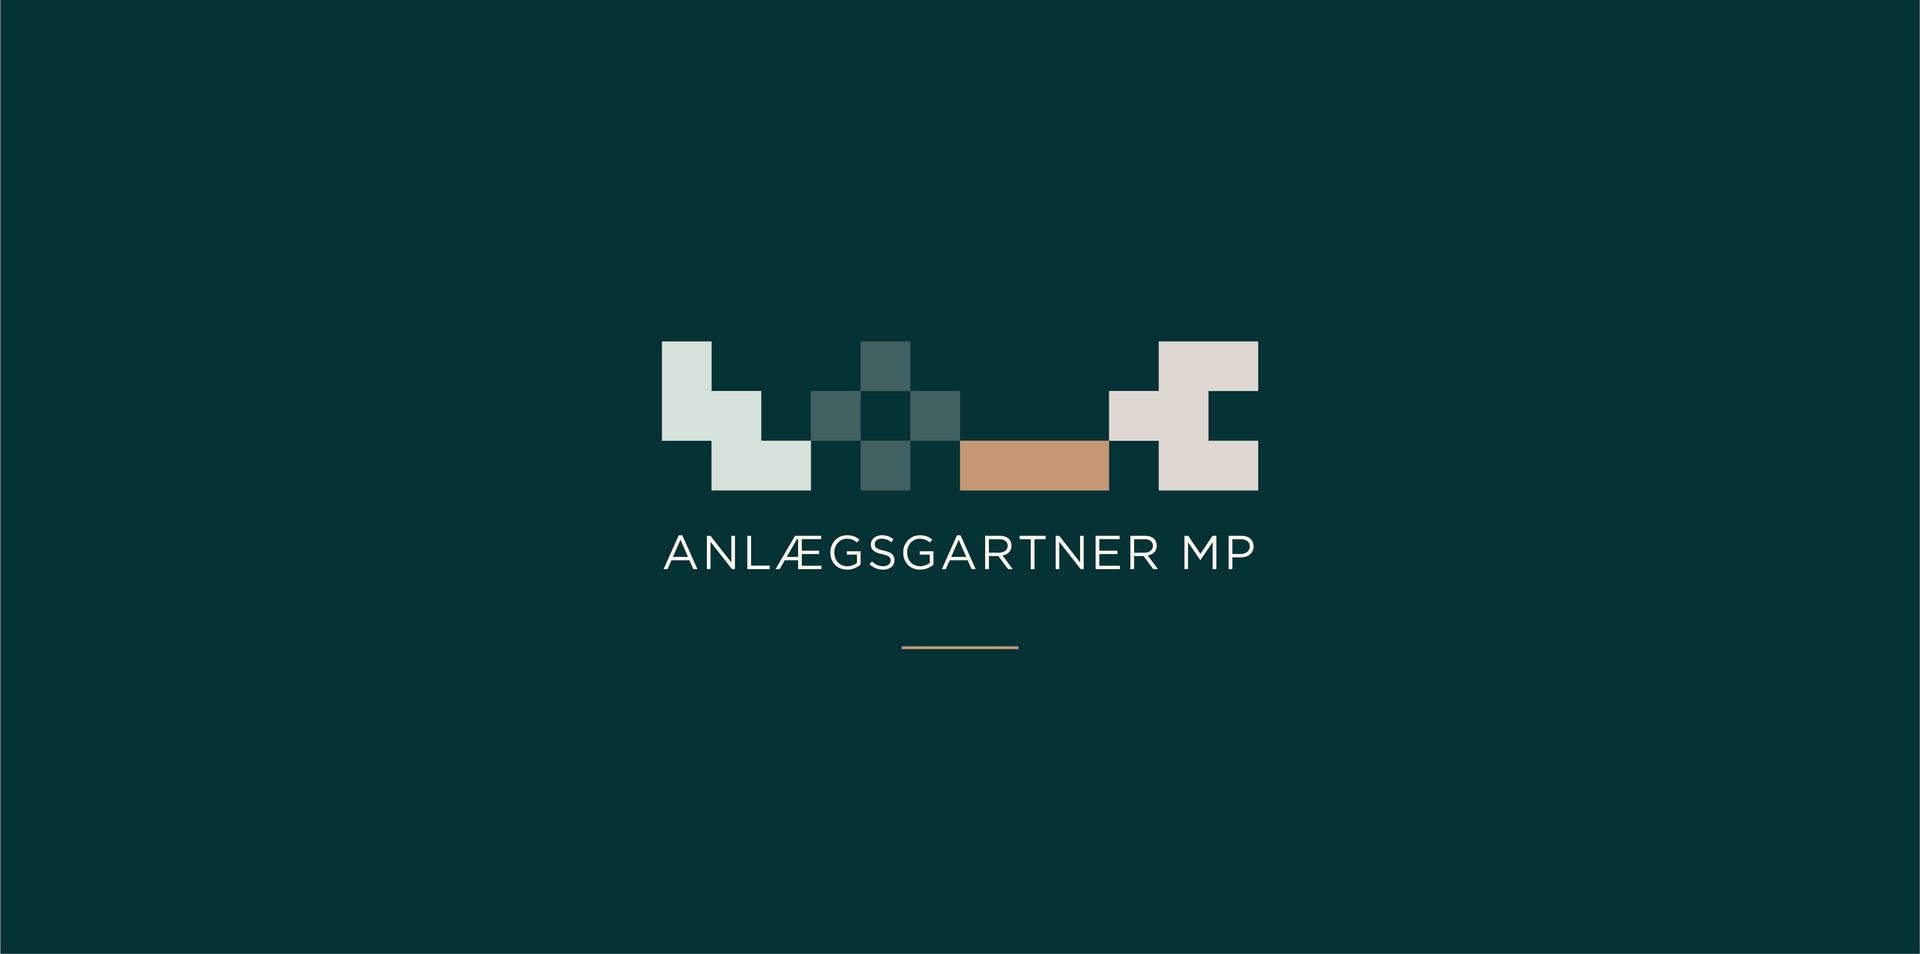 Anlaegsgartner_MP_visual_identity_logo.j